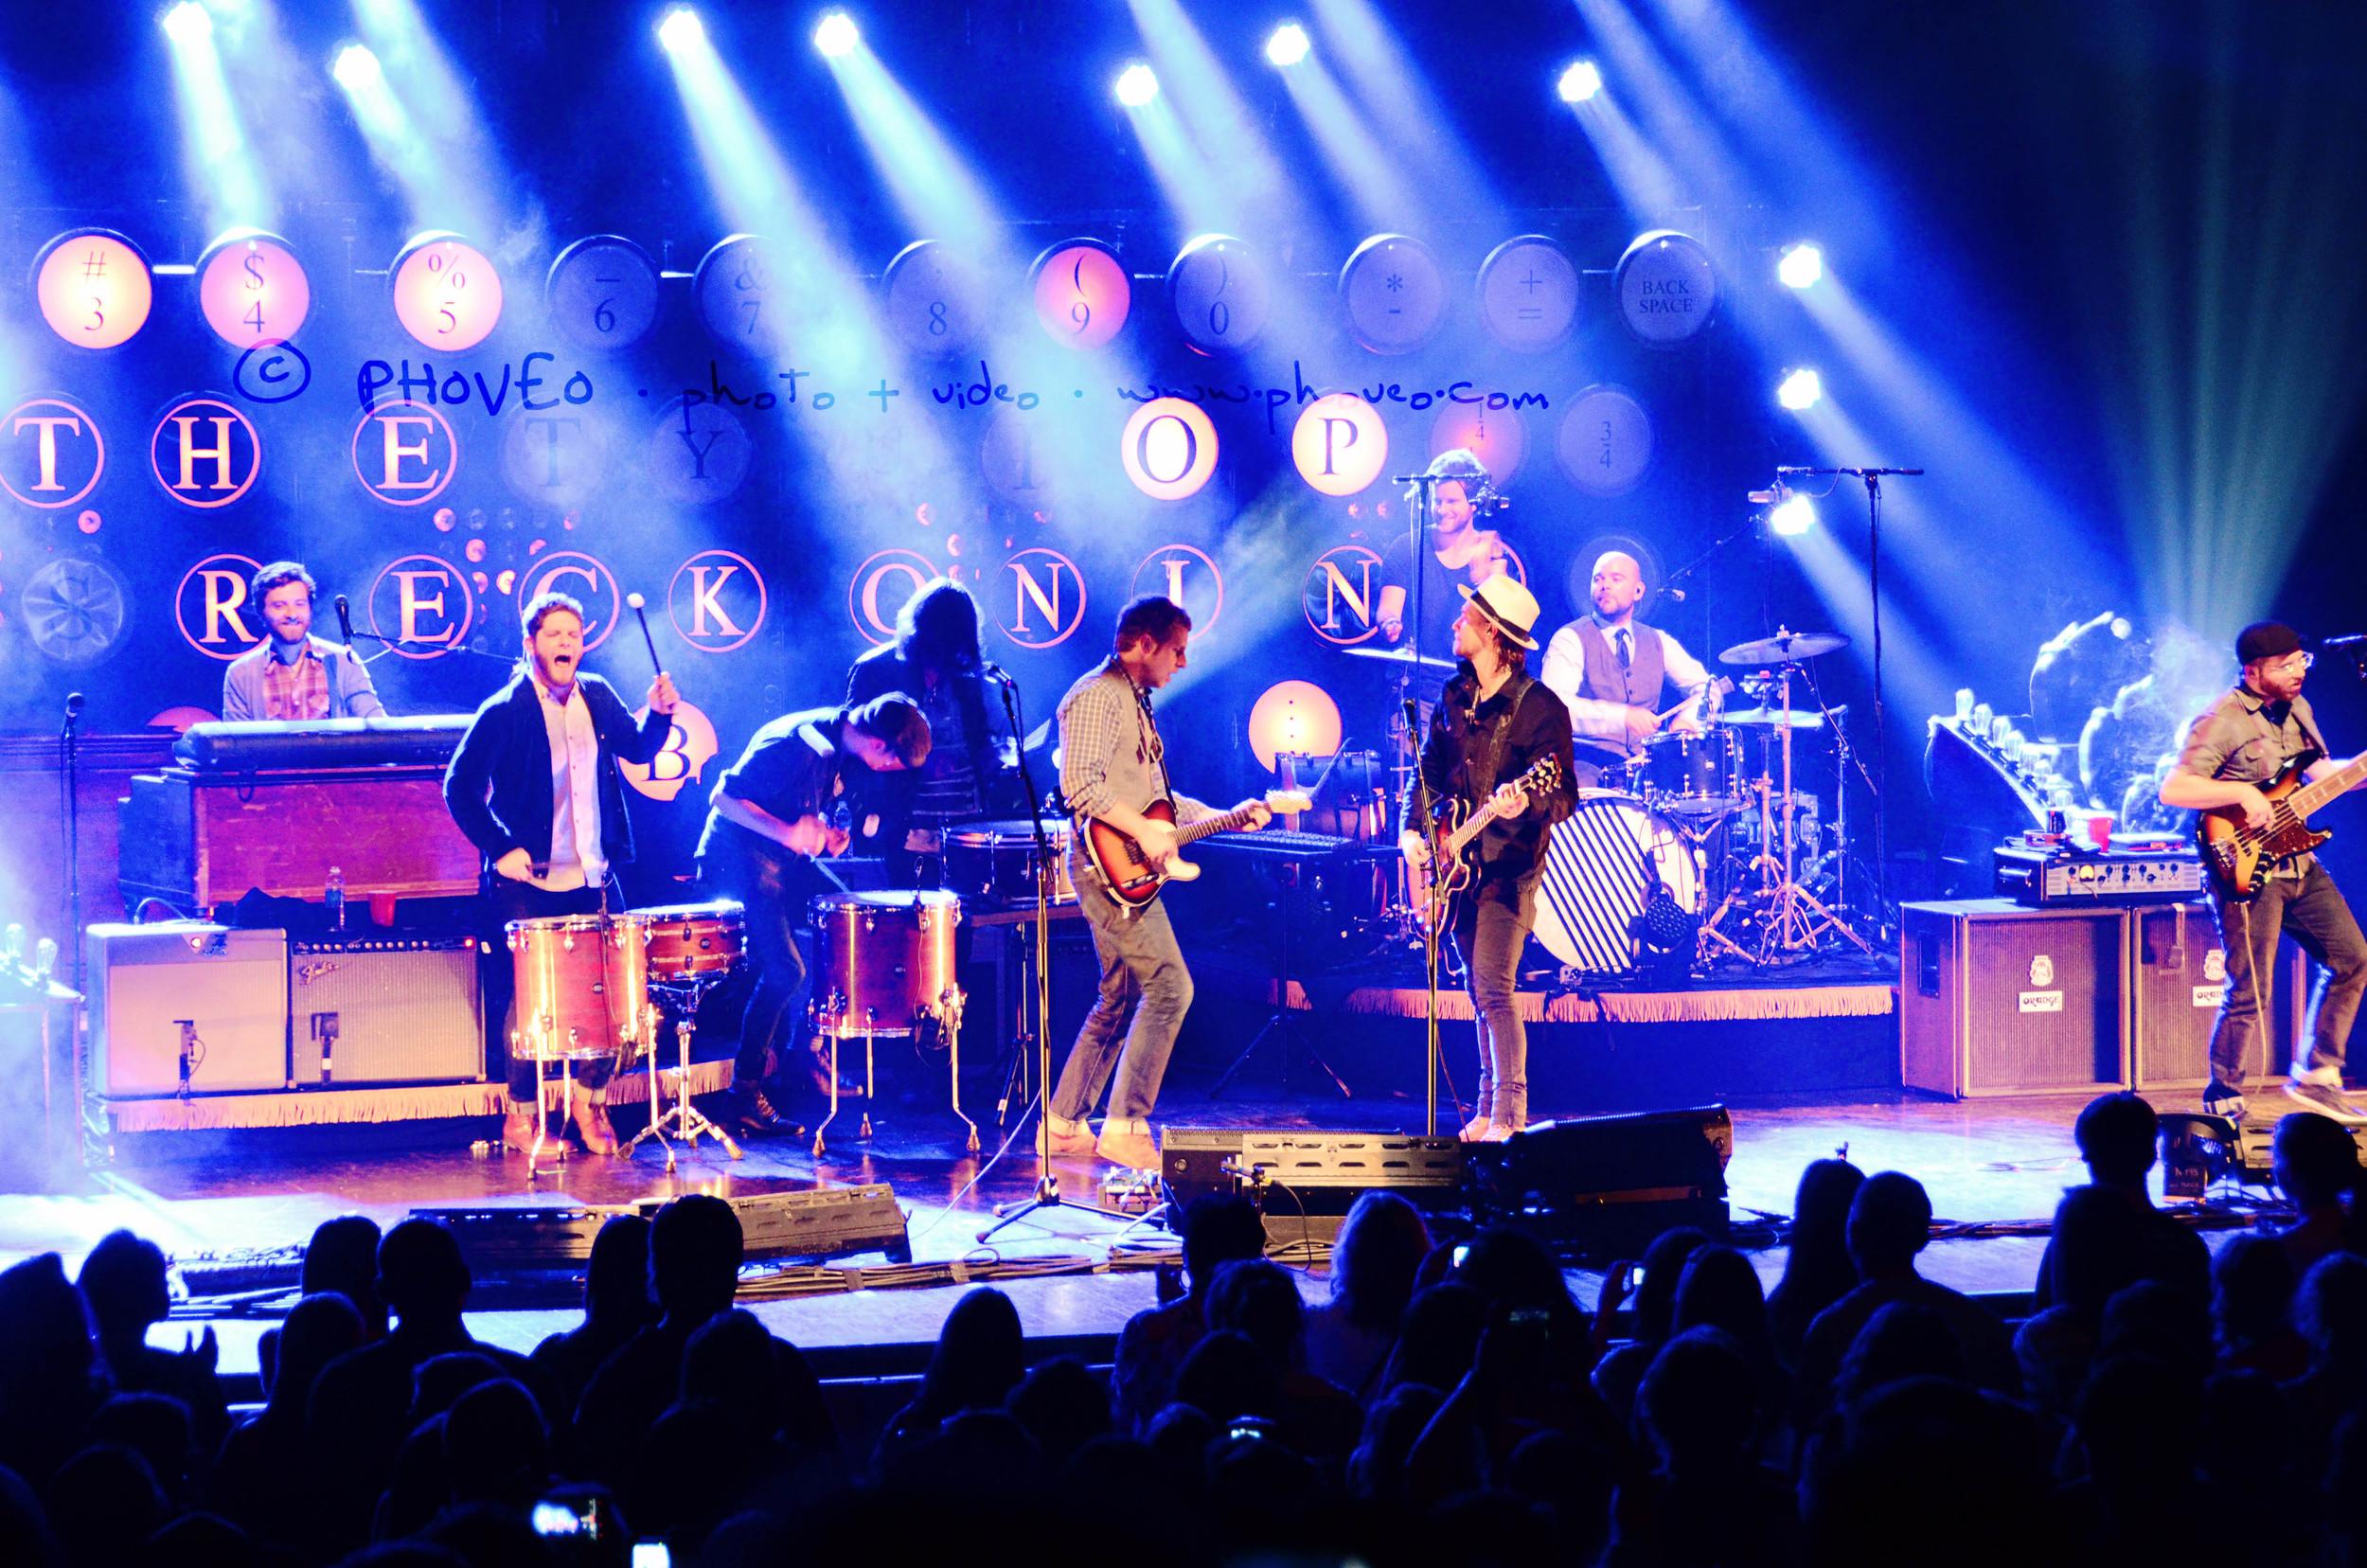 WM_concert2.jpg